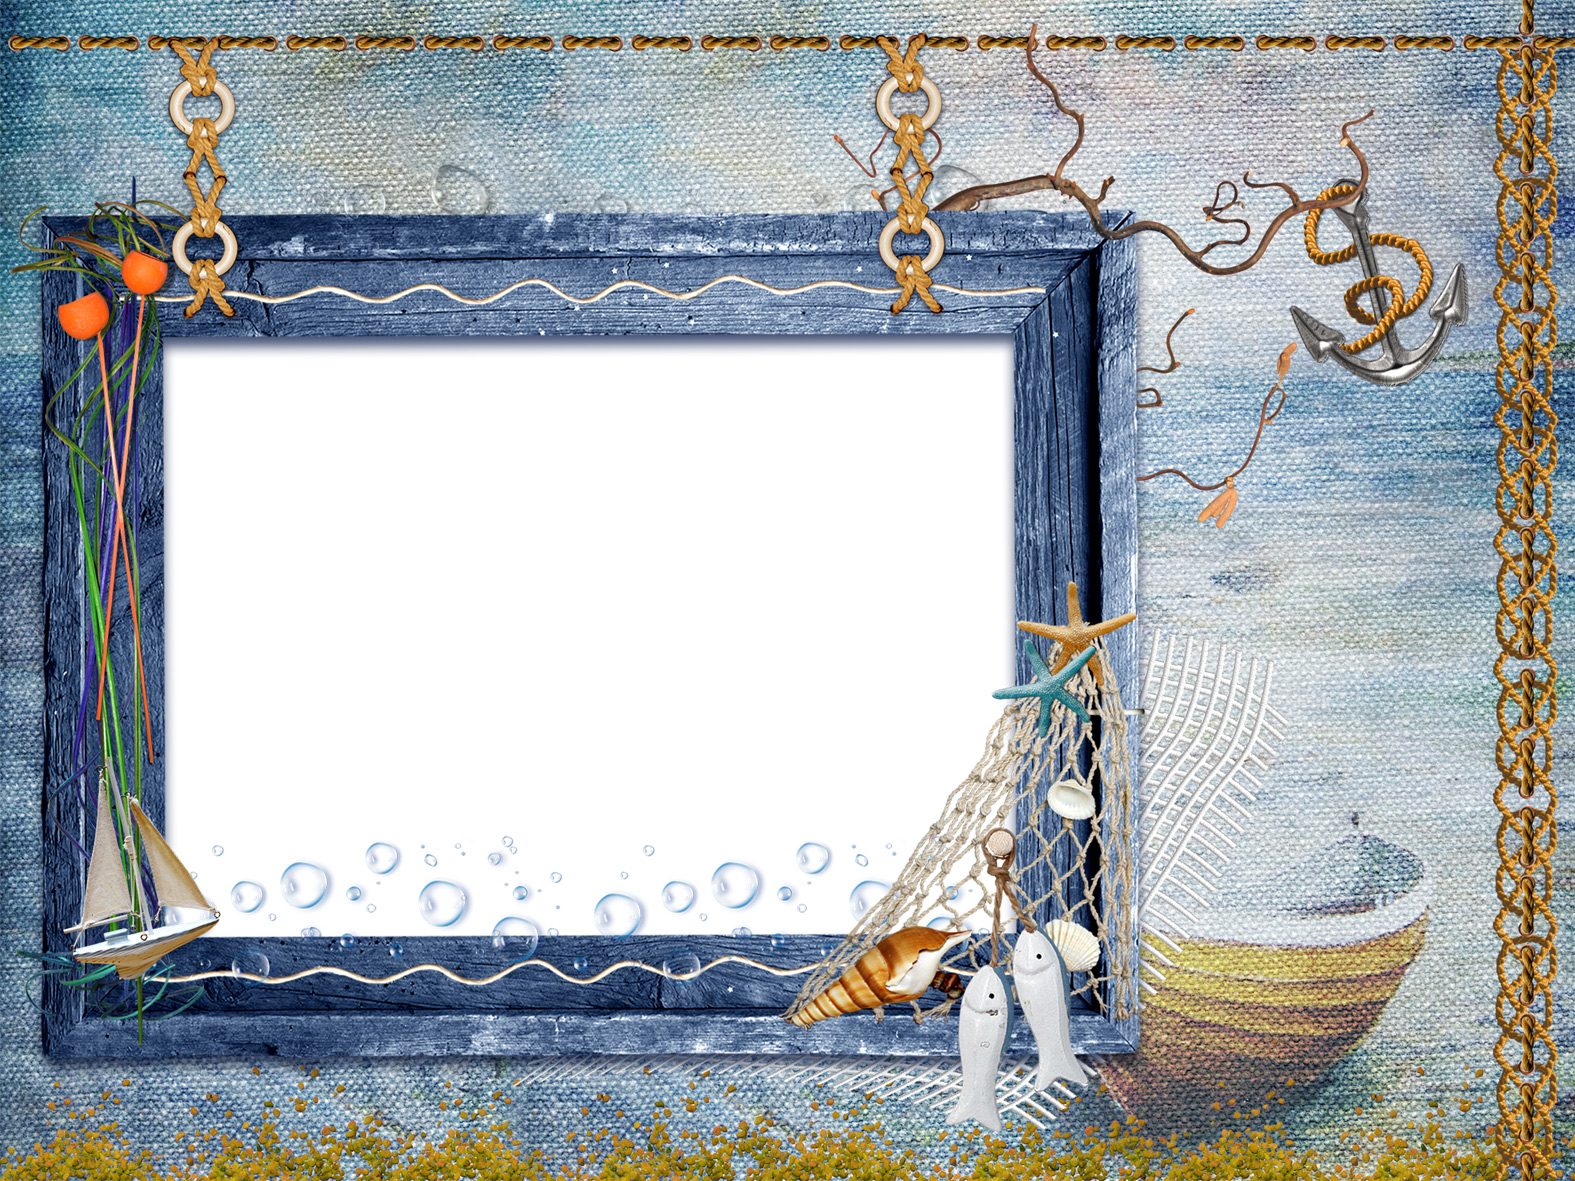 Рамка для фото моряку